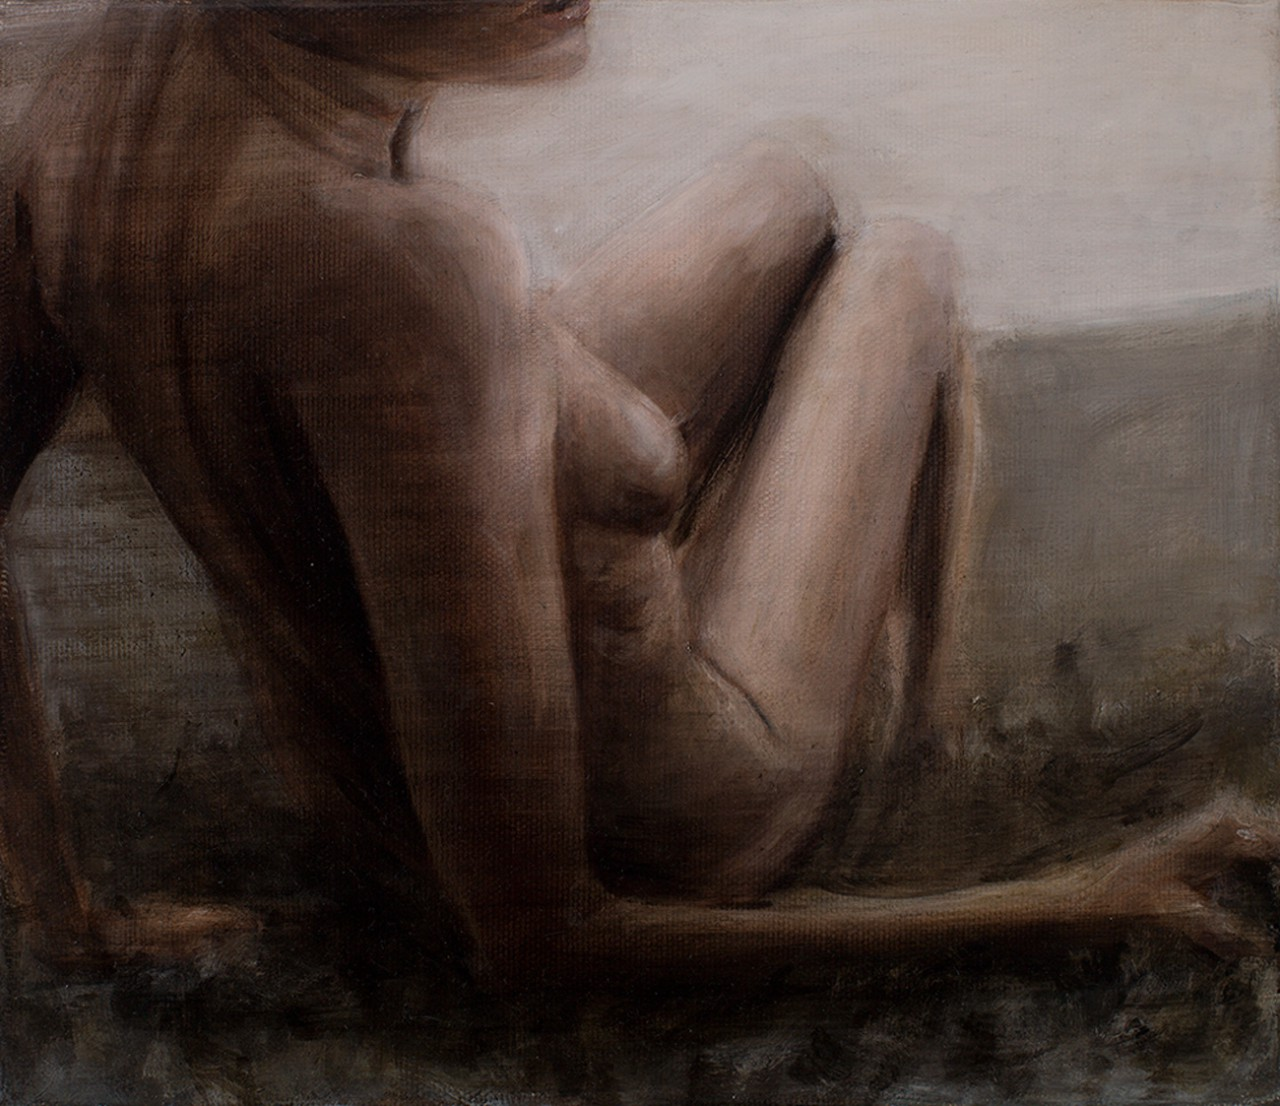 aufgestützter akt, 2014, öl/leinwand, 30 x 35 cm